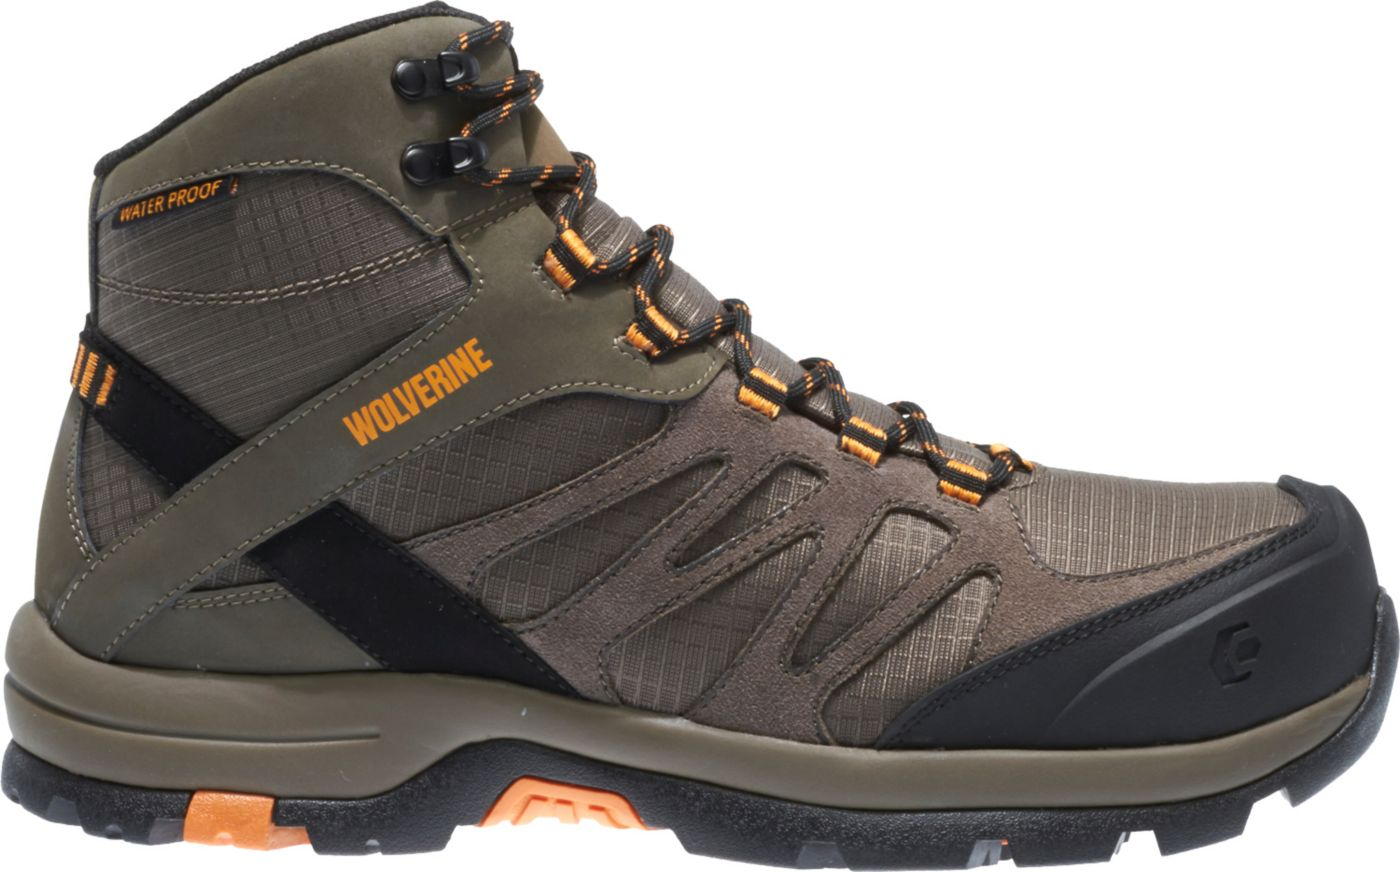 Wolverine Men's Fletcher Mid Waterproof CarbonMax EH Hiking Boots